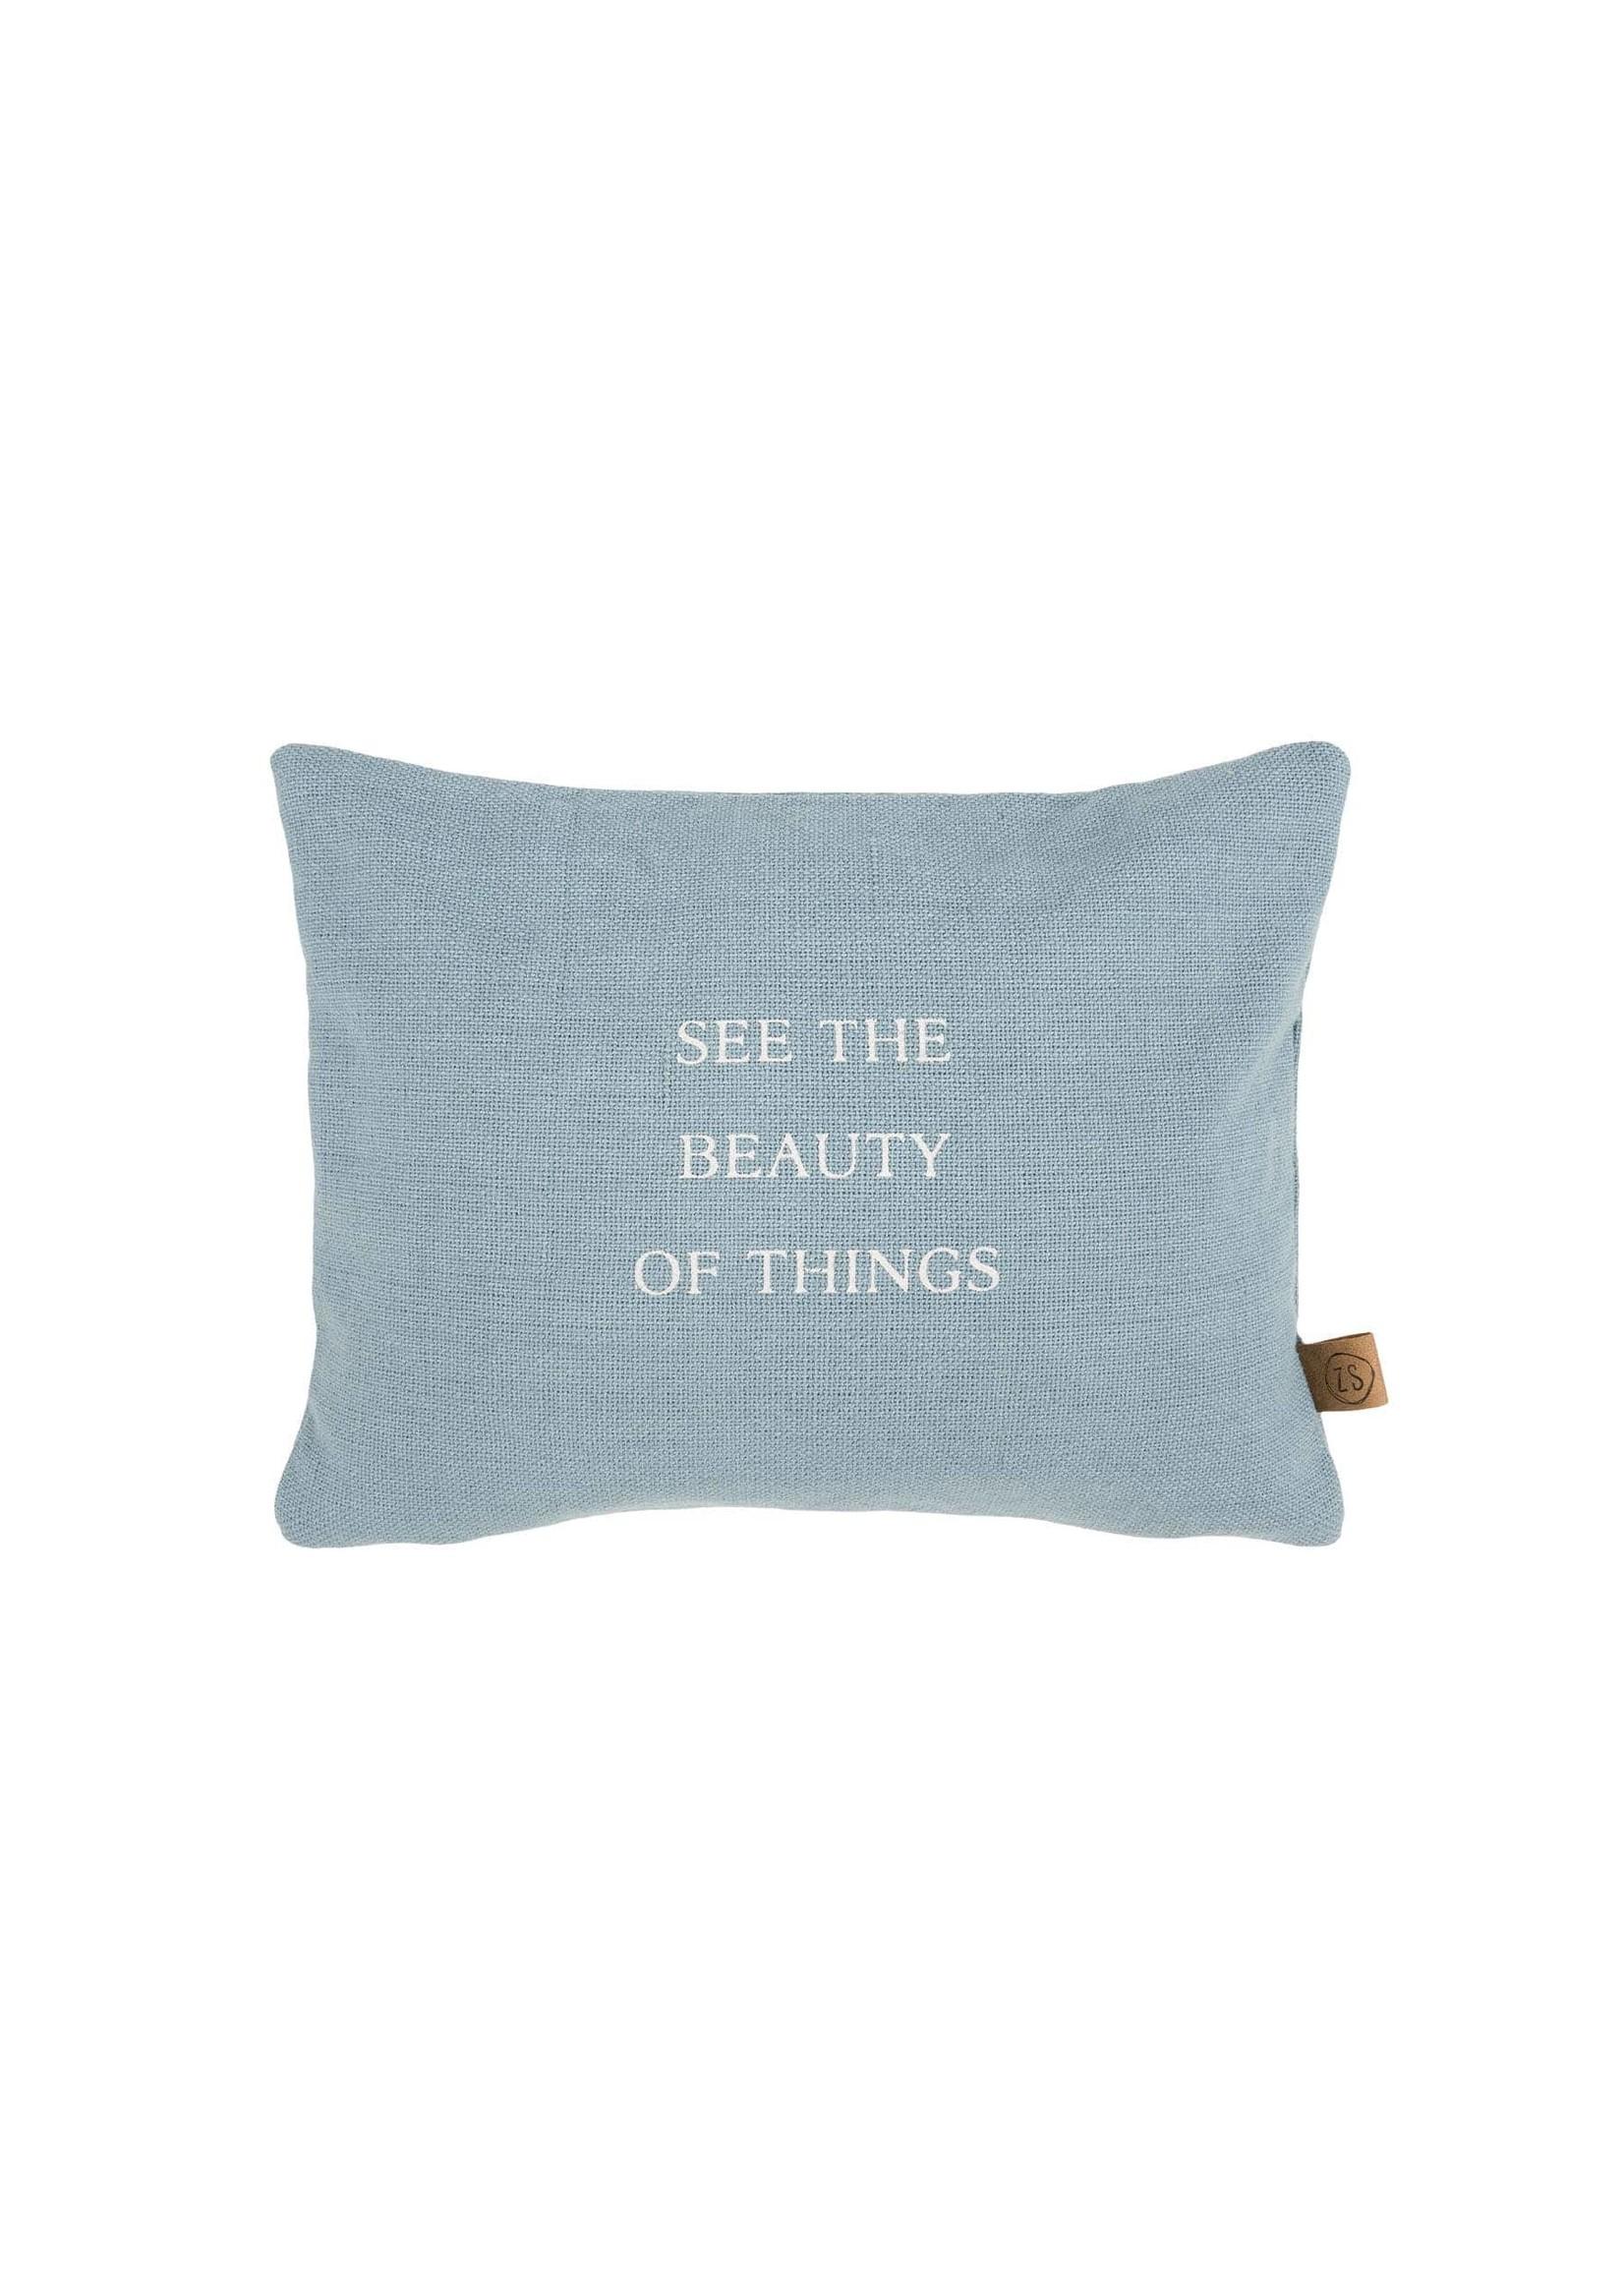 ZUSSS kussen beauty of things 35x25cm grijs-blauw